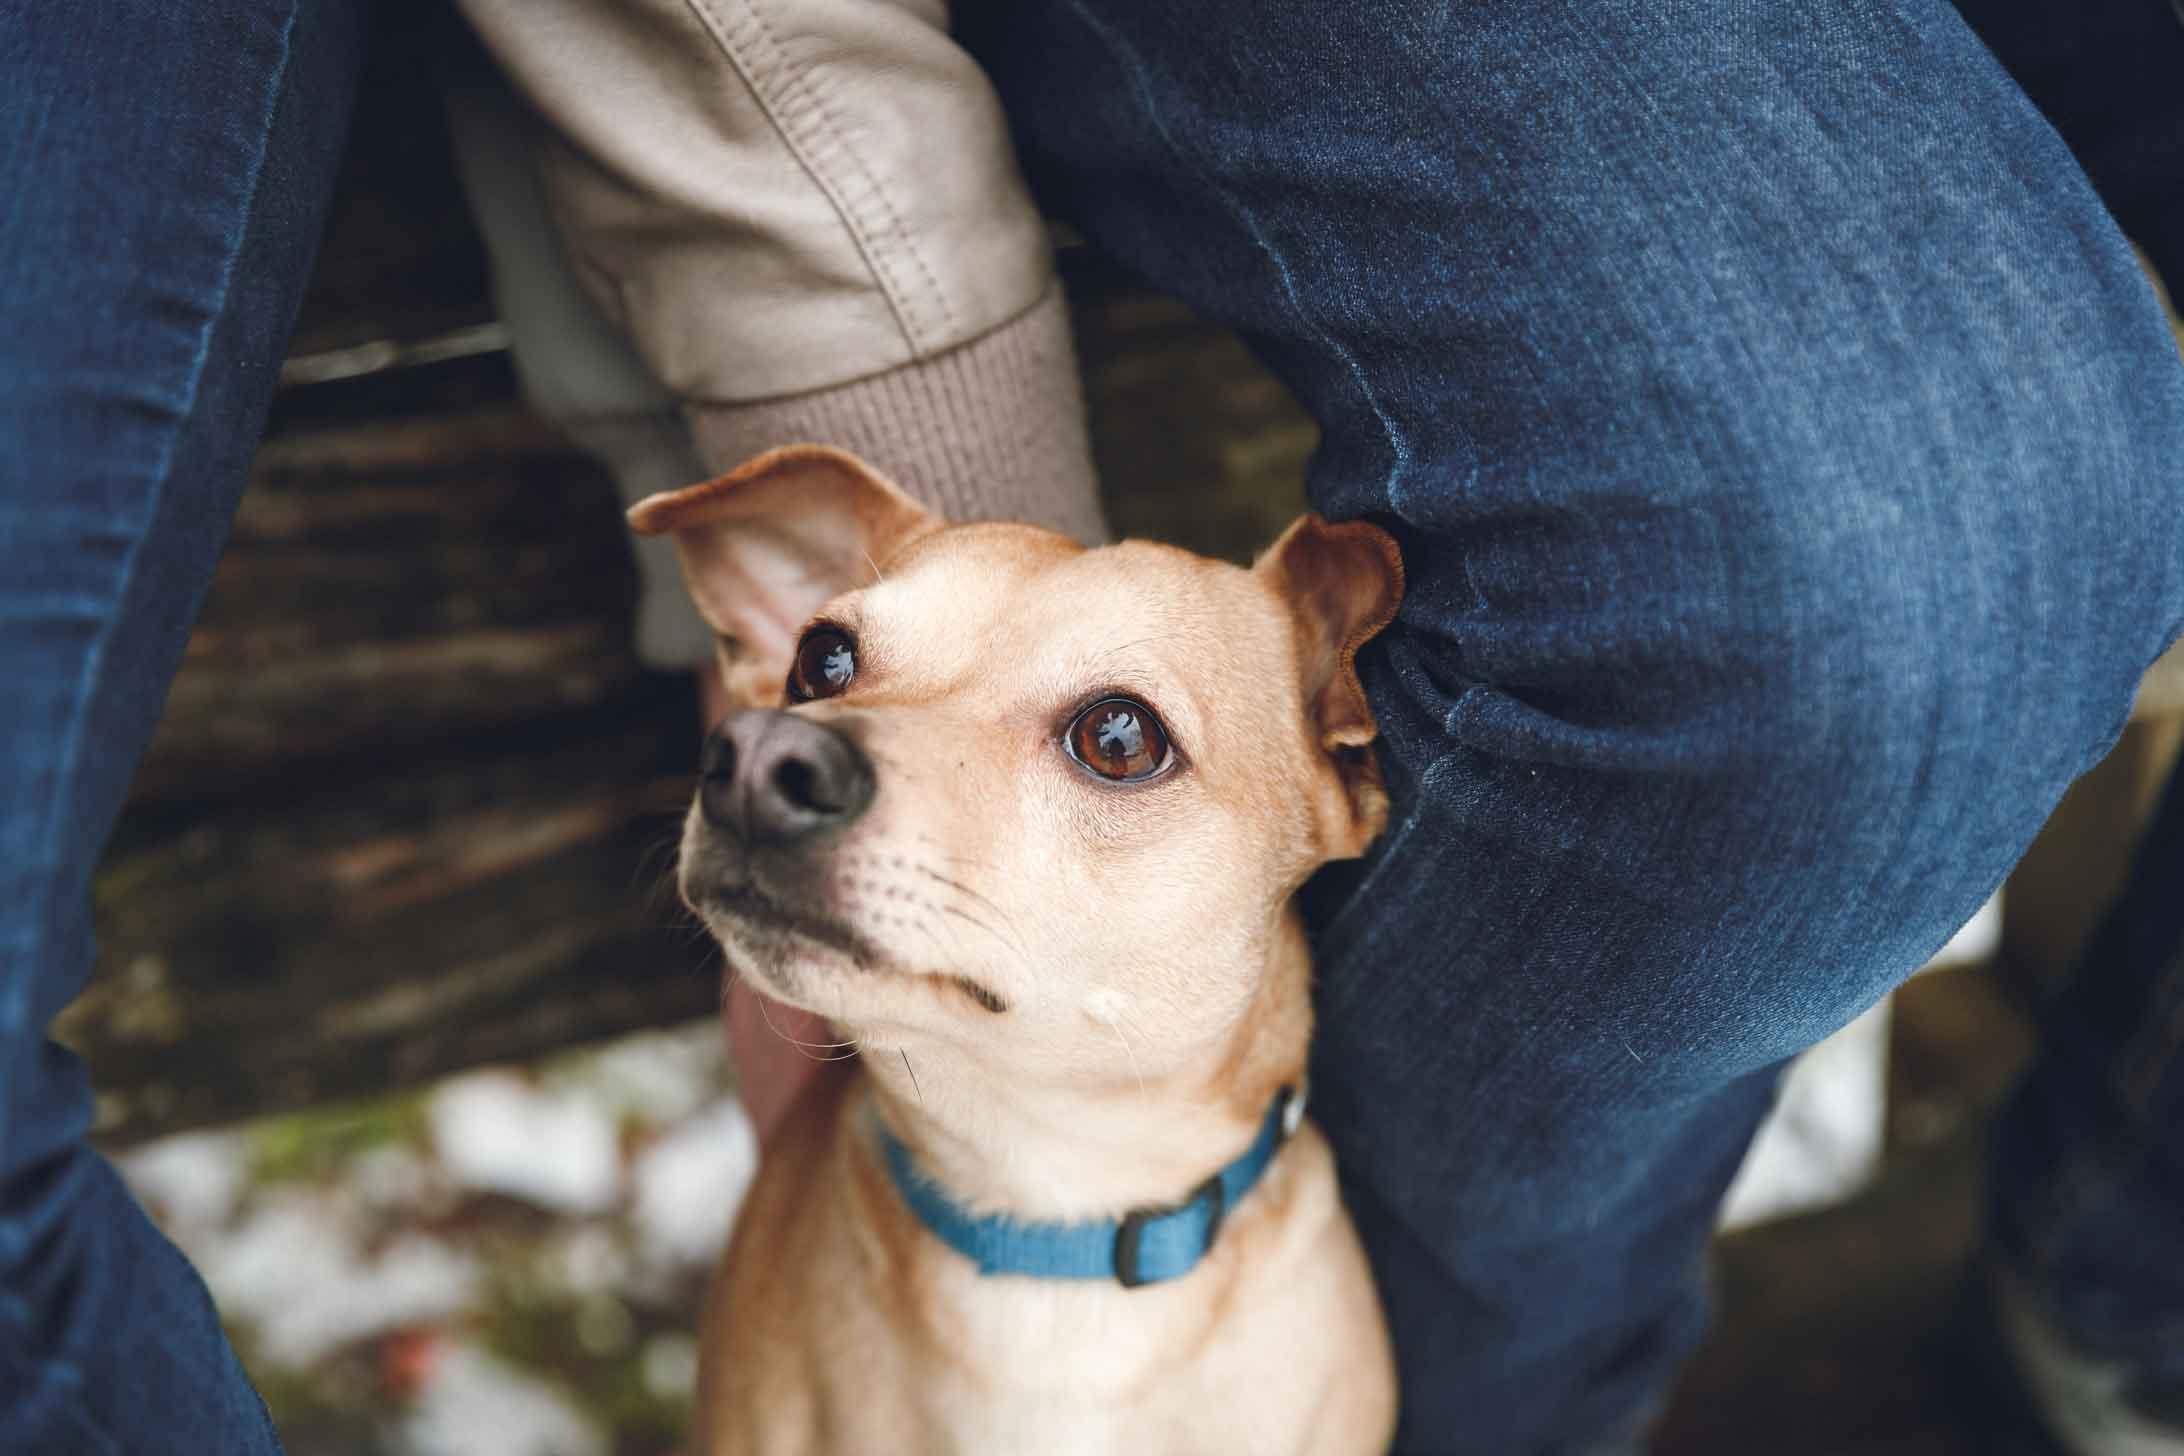 Tierfotografie und Hundefotografie IMG 8044w